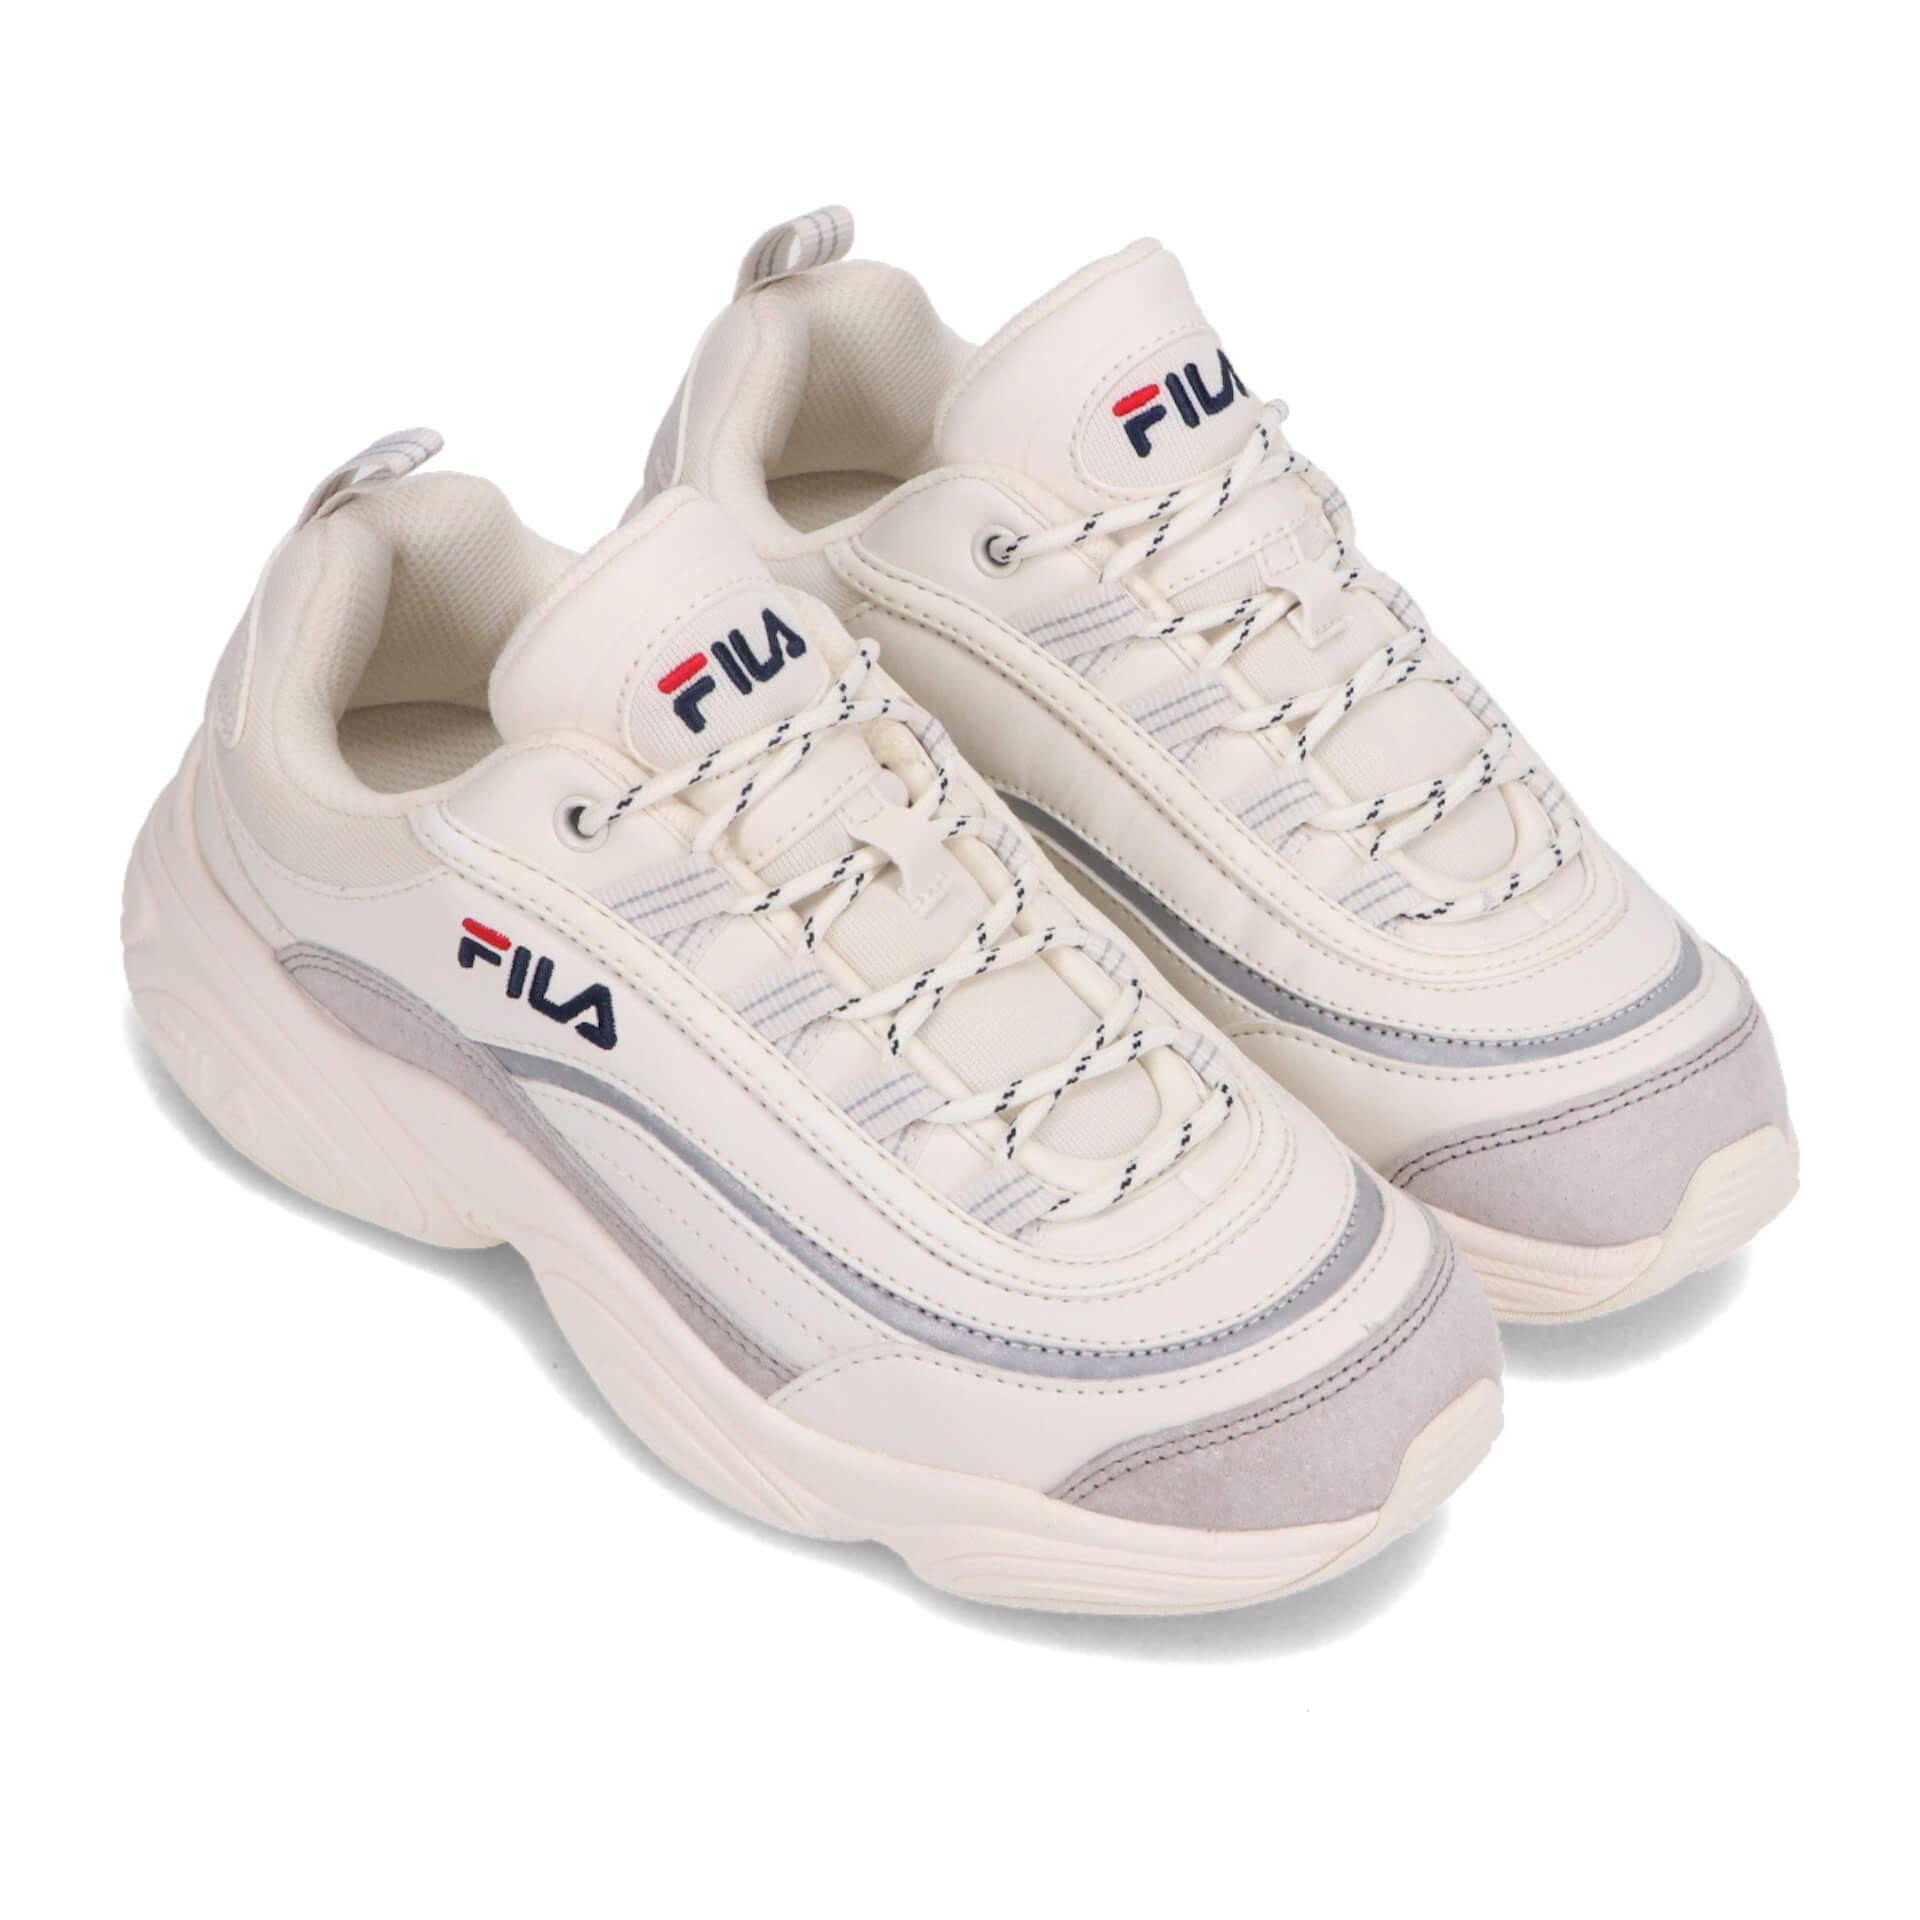 FILAの人気モデル『INTERATION』と『Z BUFFER2』にブラックベースが登場!『RAY RUN』ニューカラーもatmos系列限定で発売 fashion201216_atmos_fila_18